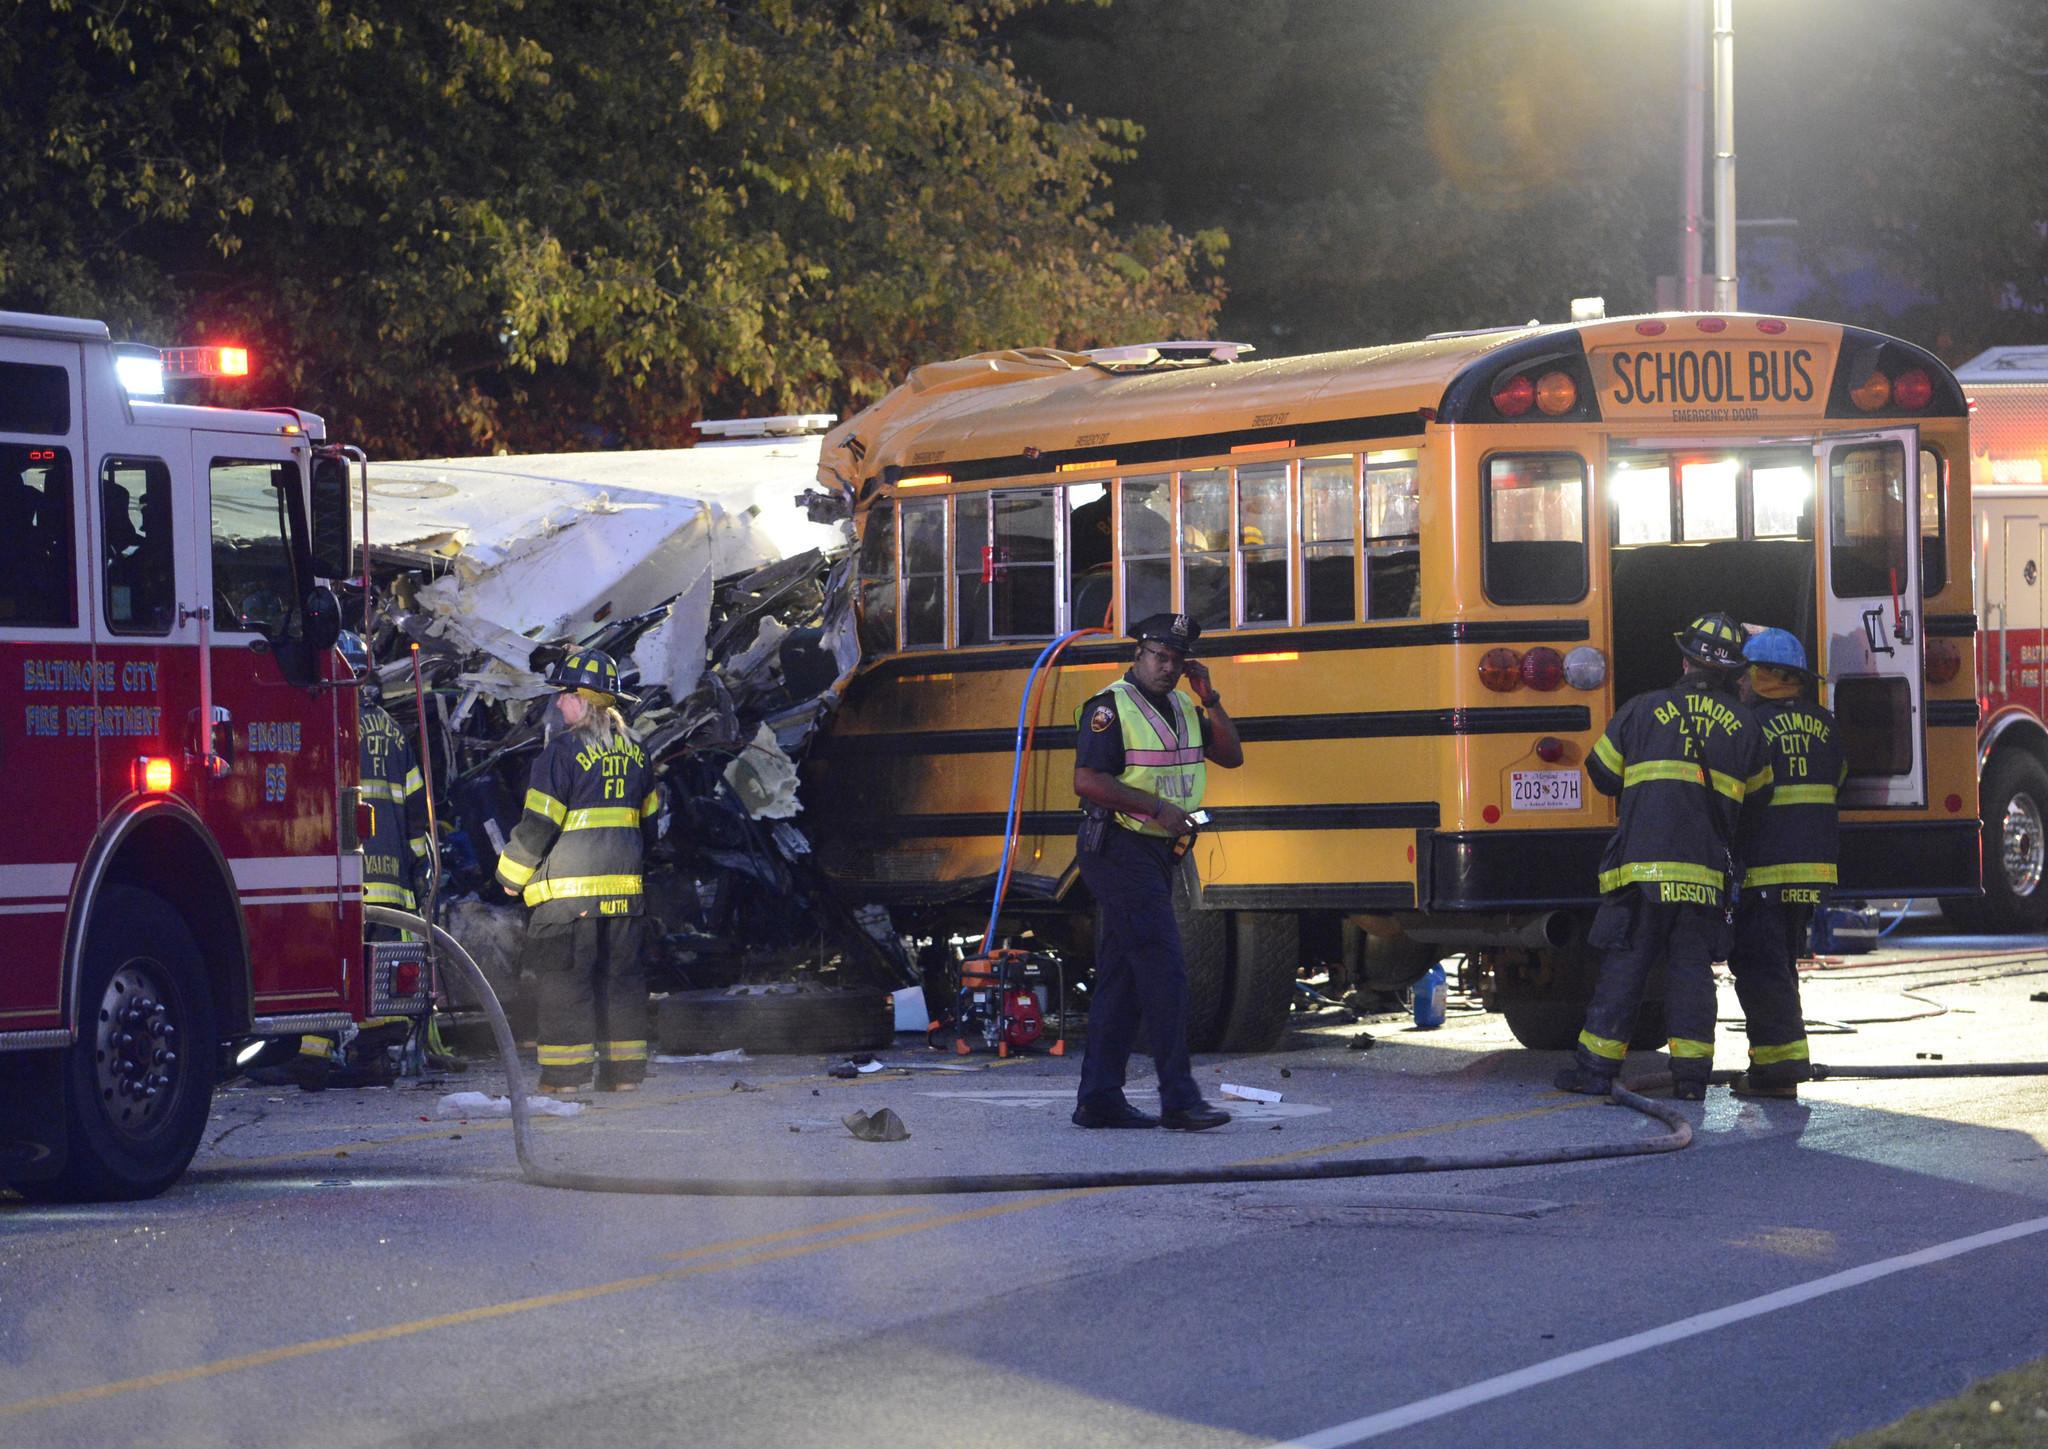 http://www.trbimg.com/img-5818c9dd/turbine/bs-md-ci-bus-crash-history-20161031